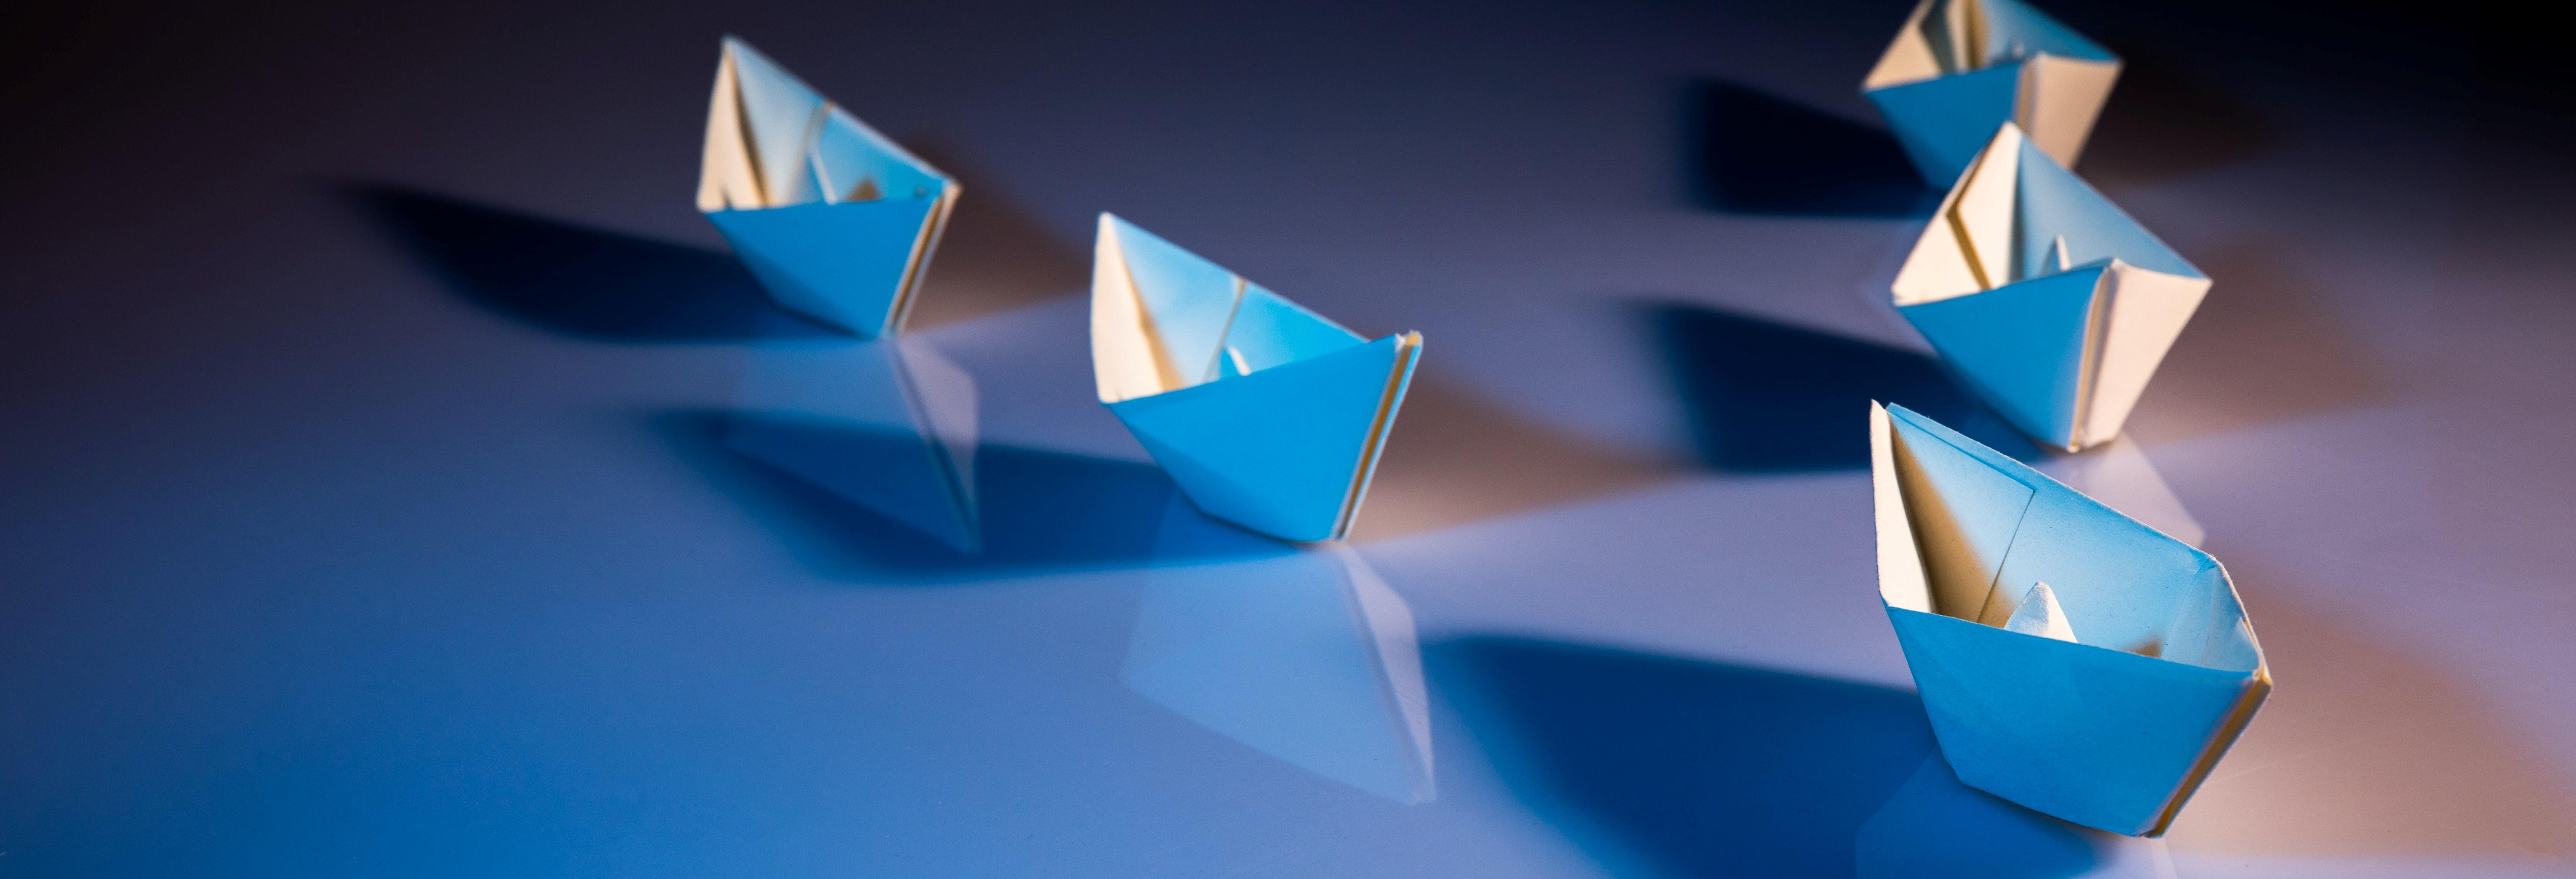 Paradoxo híbrido: Desafios do trabalho híbrido para os líderes